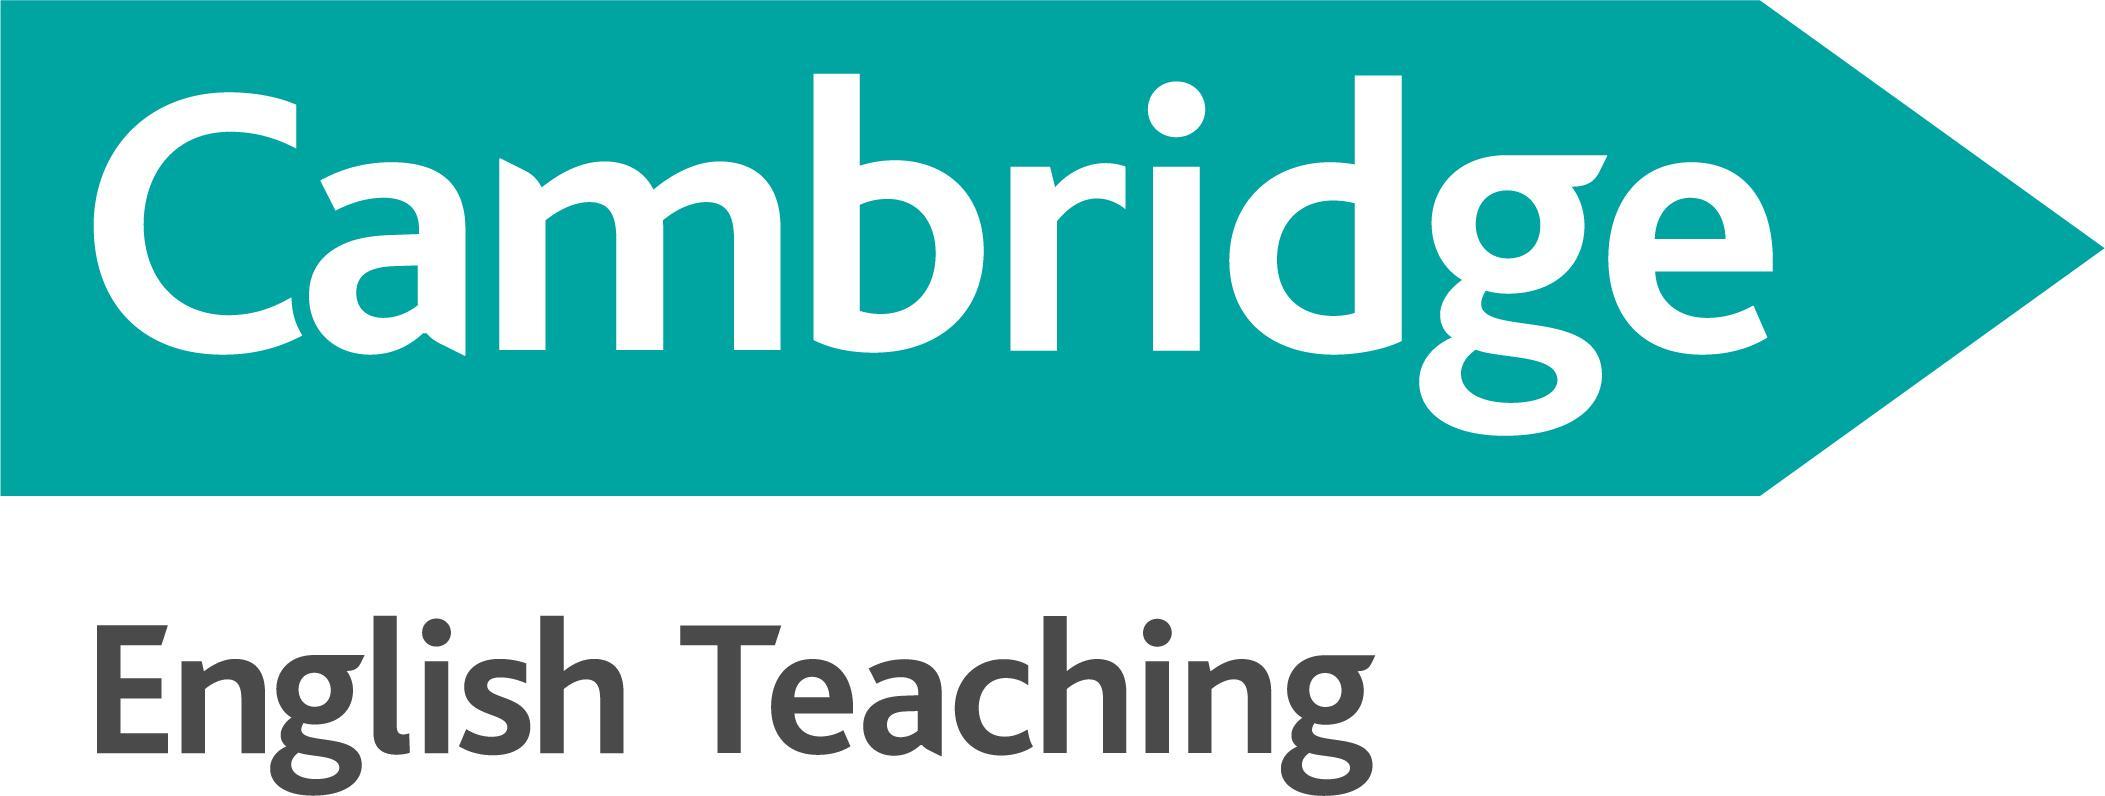 cambridge-teacher-training-logo